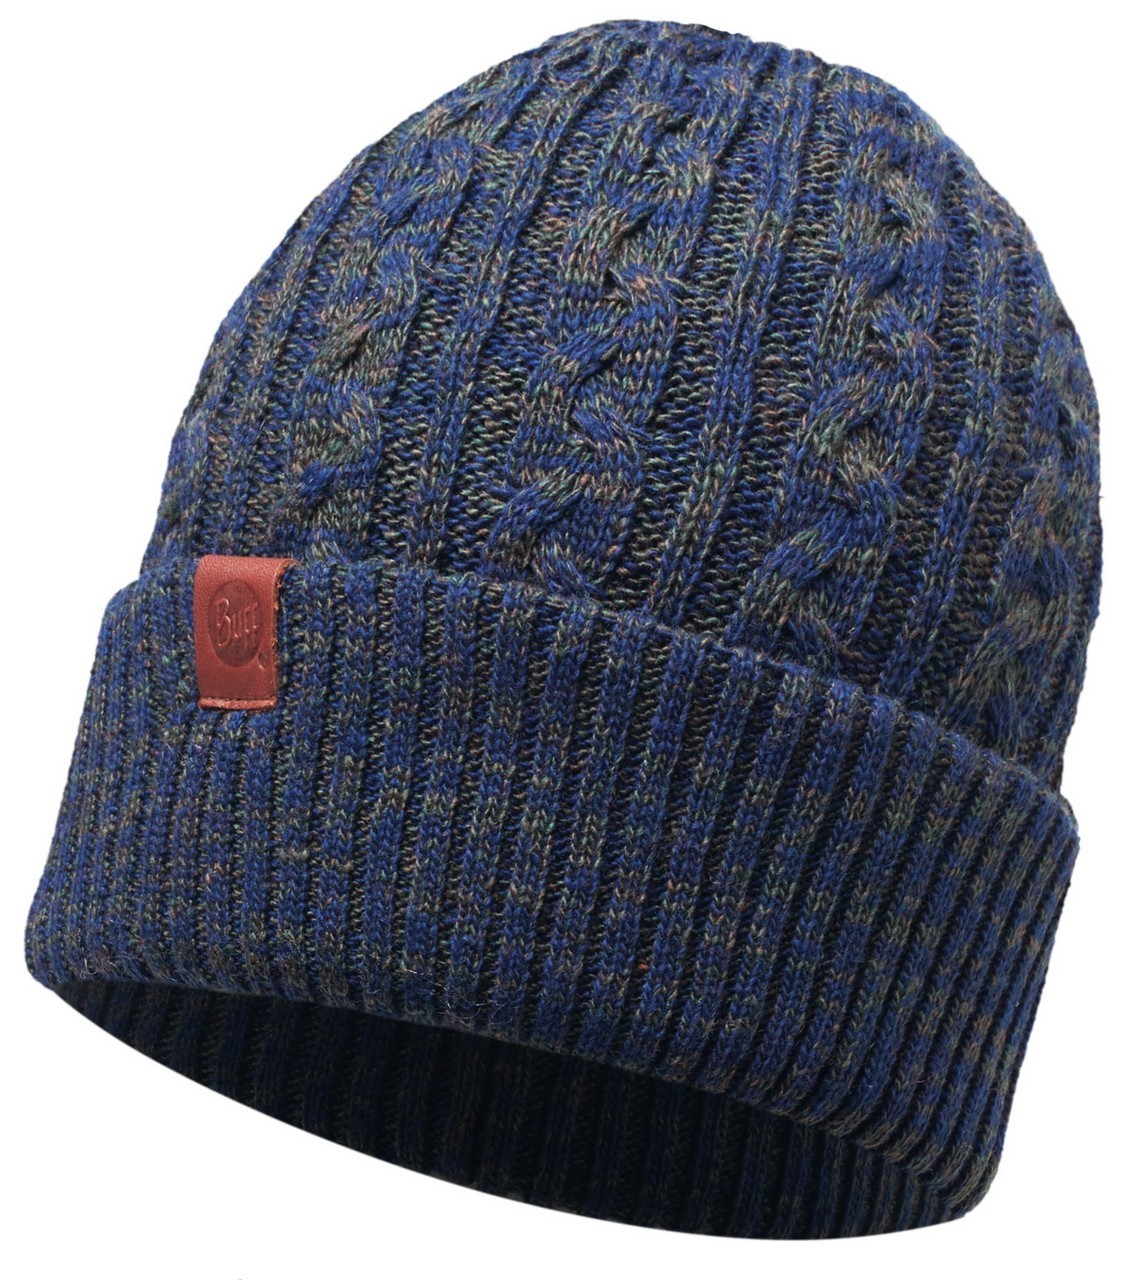 Шапки с отворотом Вязаная шапка Buff Braidy Moss 116034.851.10.00.jpg